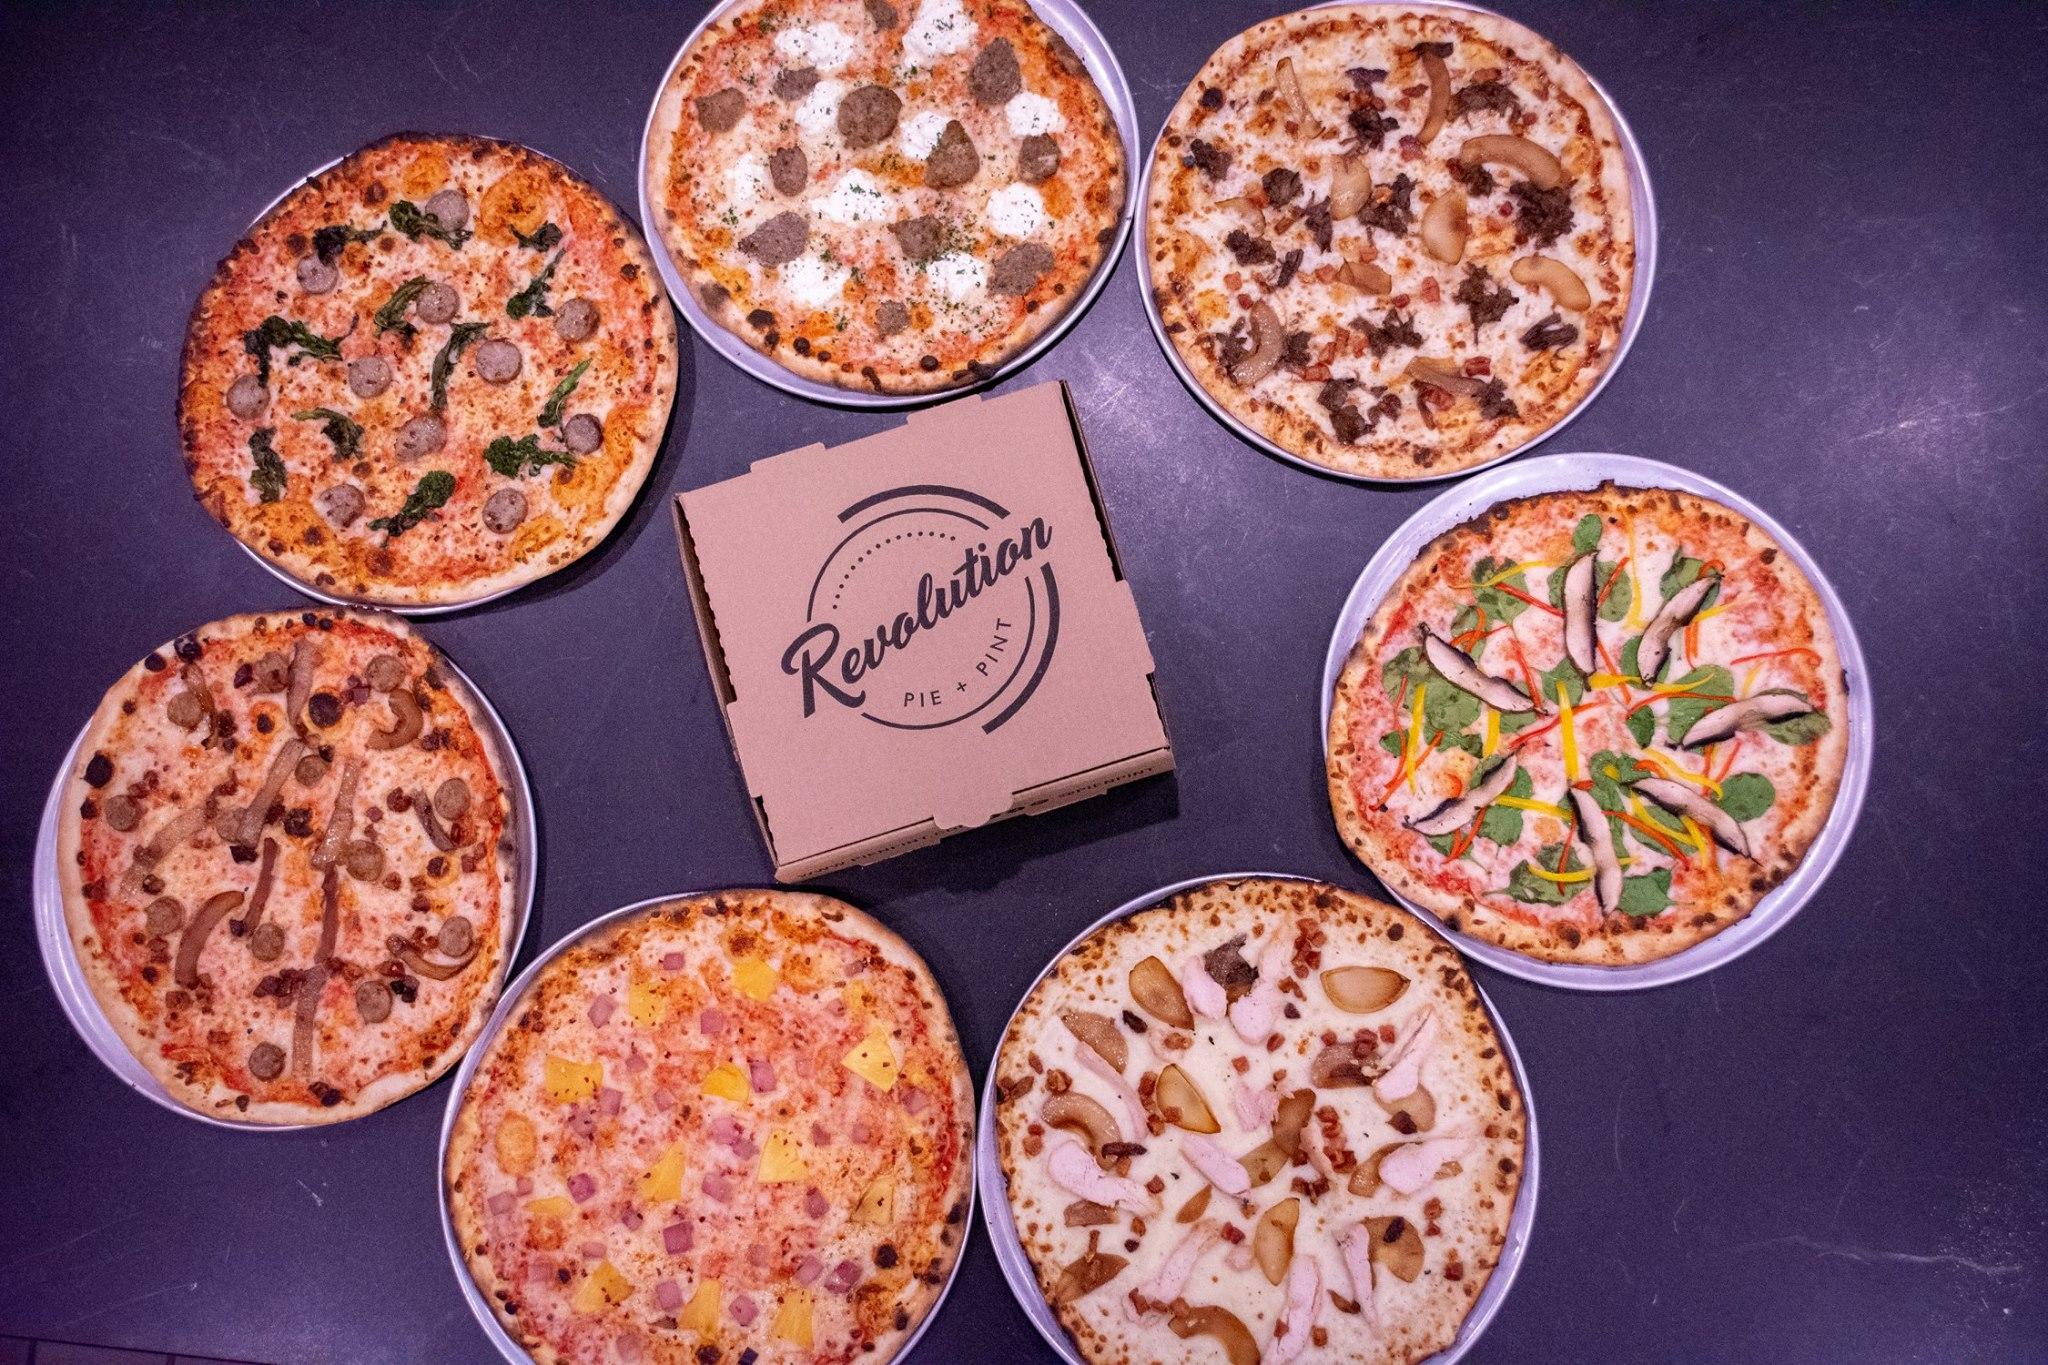 Revolution Pie & Pint -